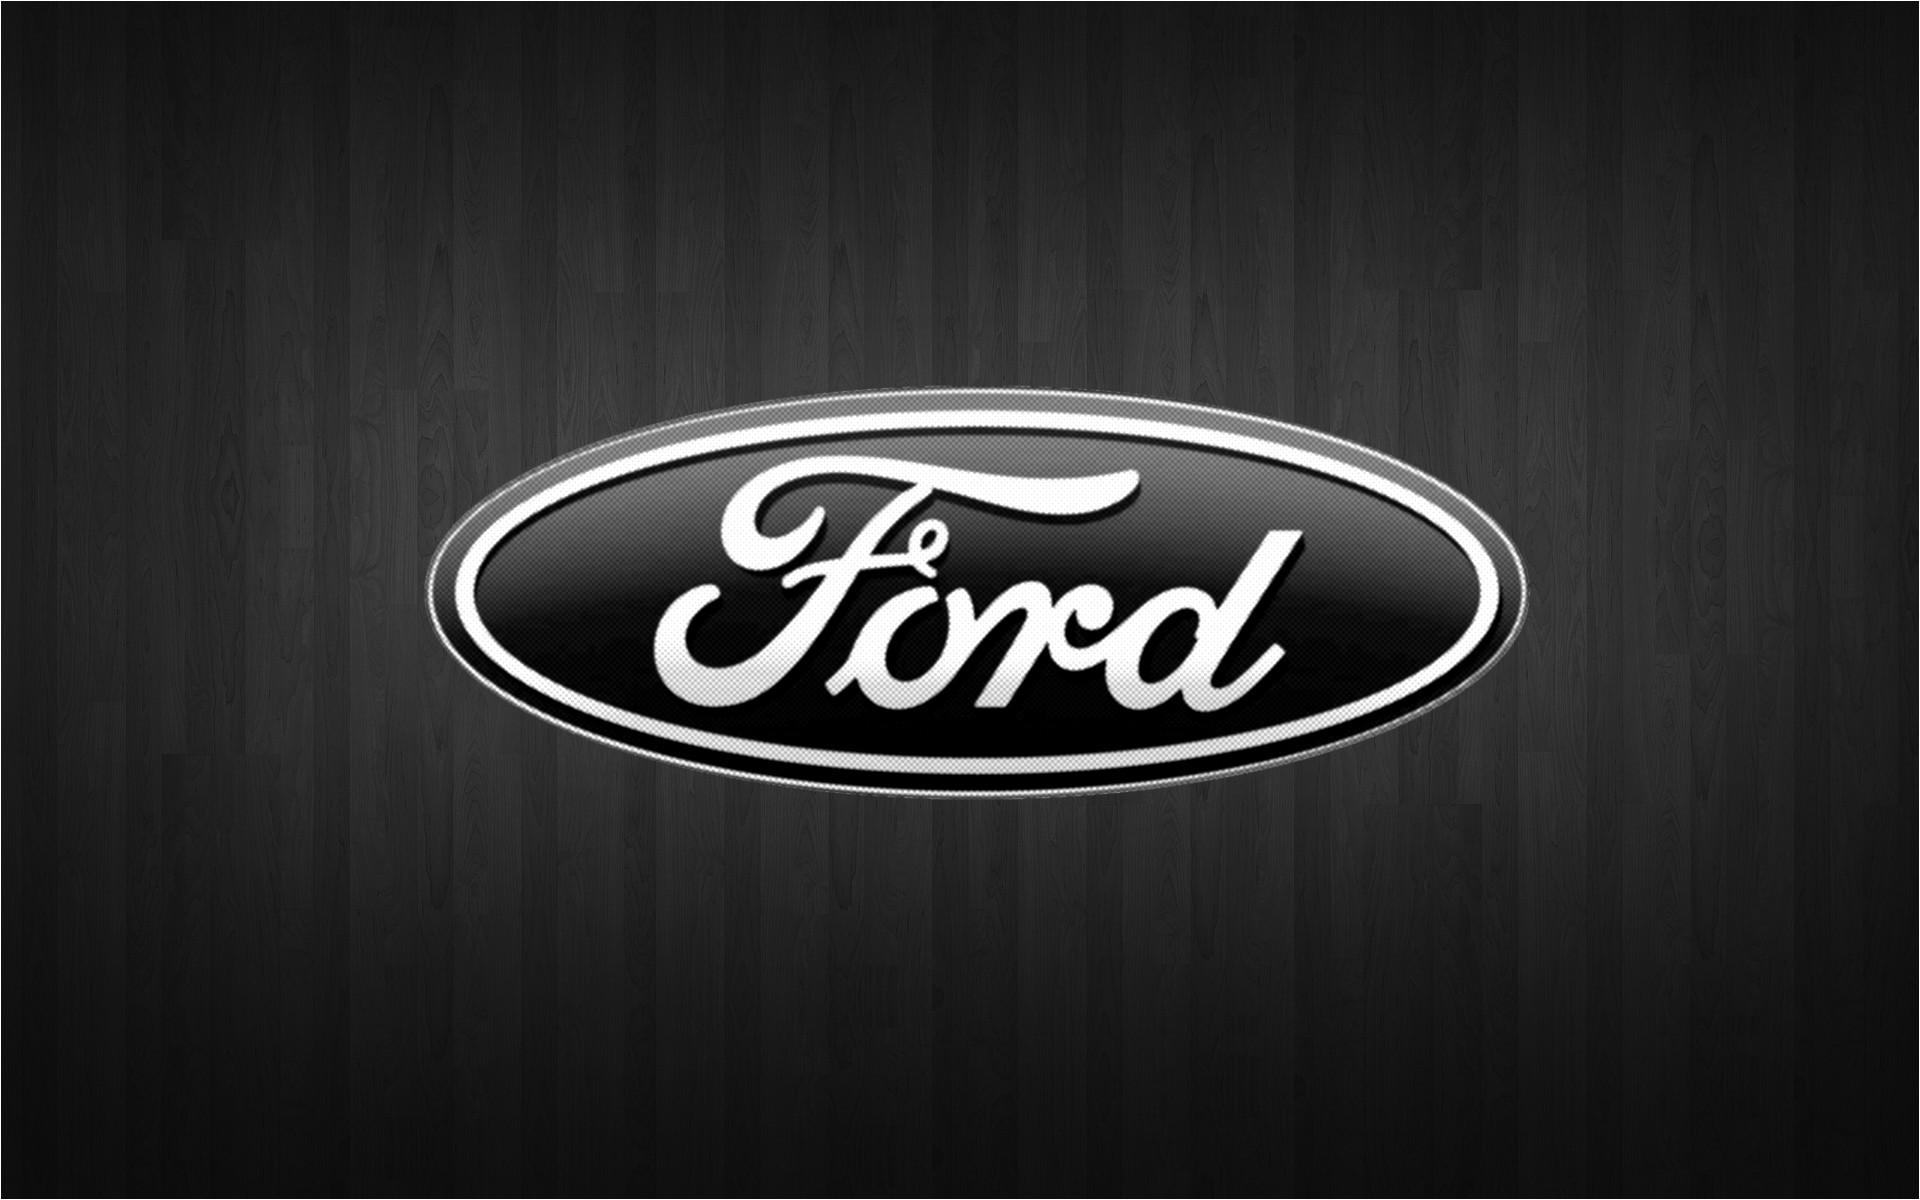 Ford Logo Wallpaper HD #7001624 …